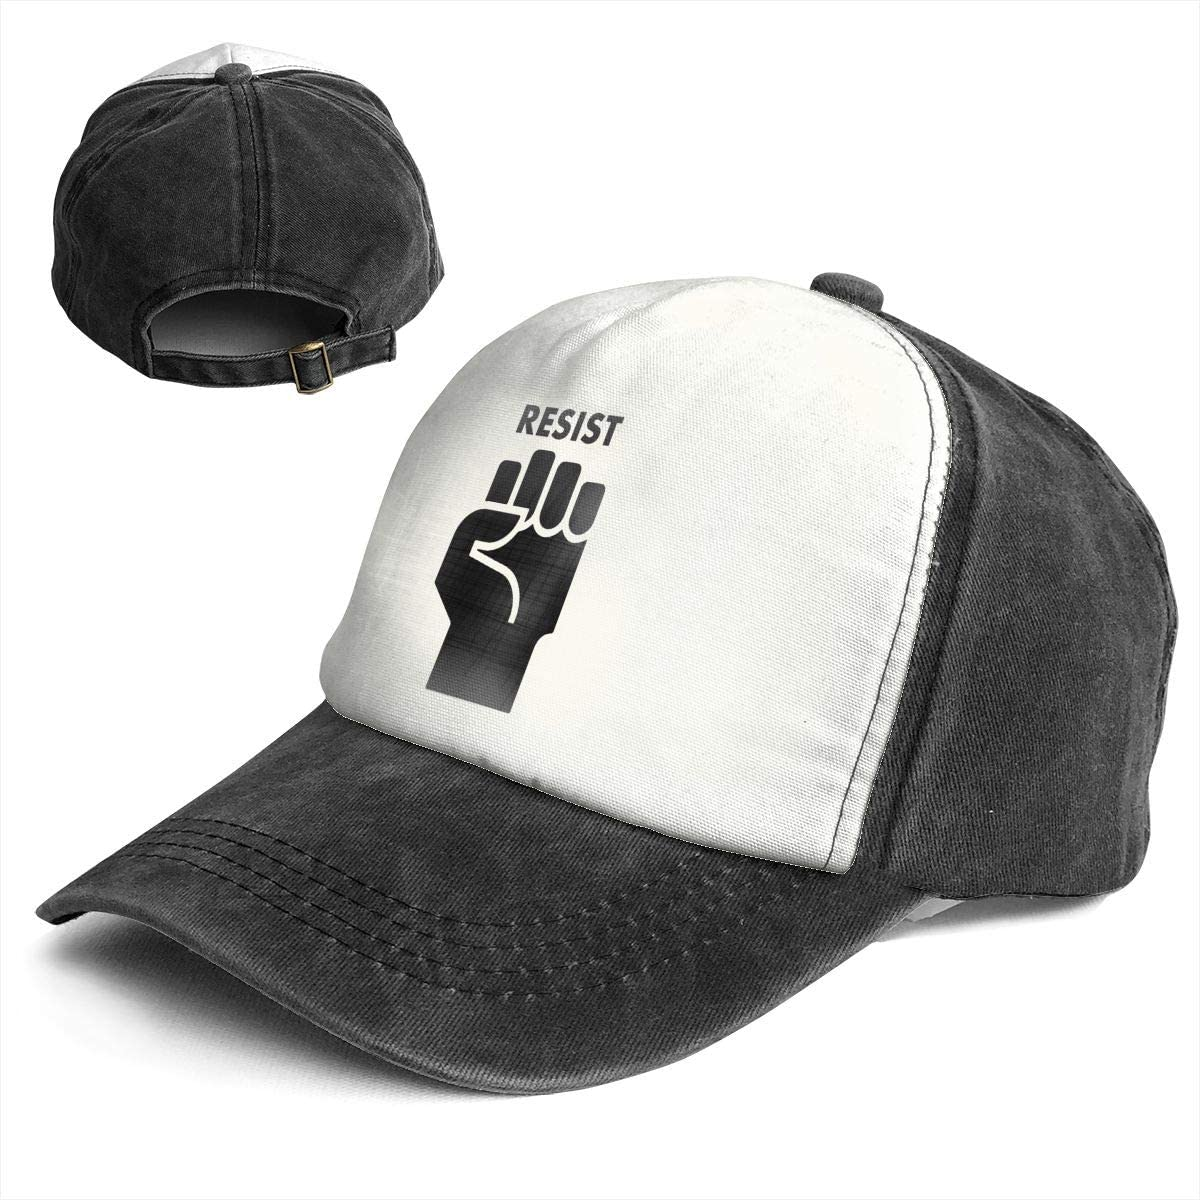 Fashion Vintage Hat Resist Fist Adjustable Dad Hat Baseball Cowboy Cap